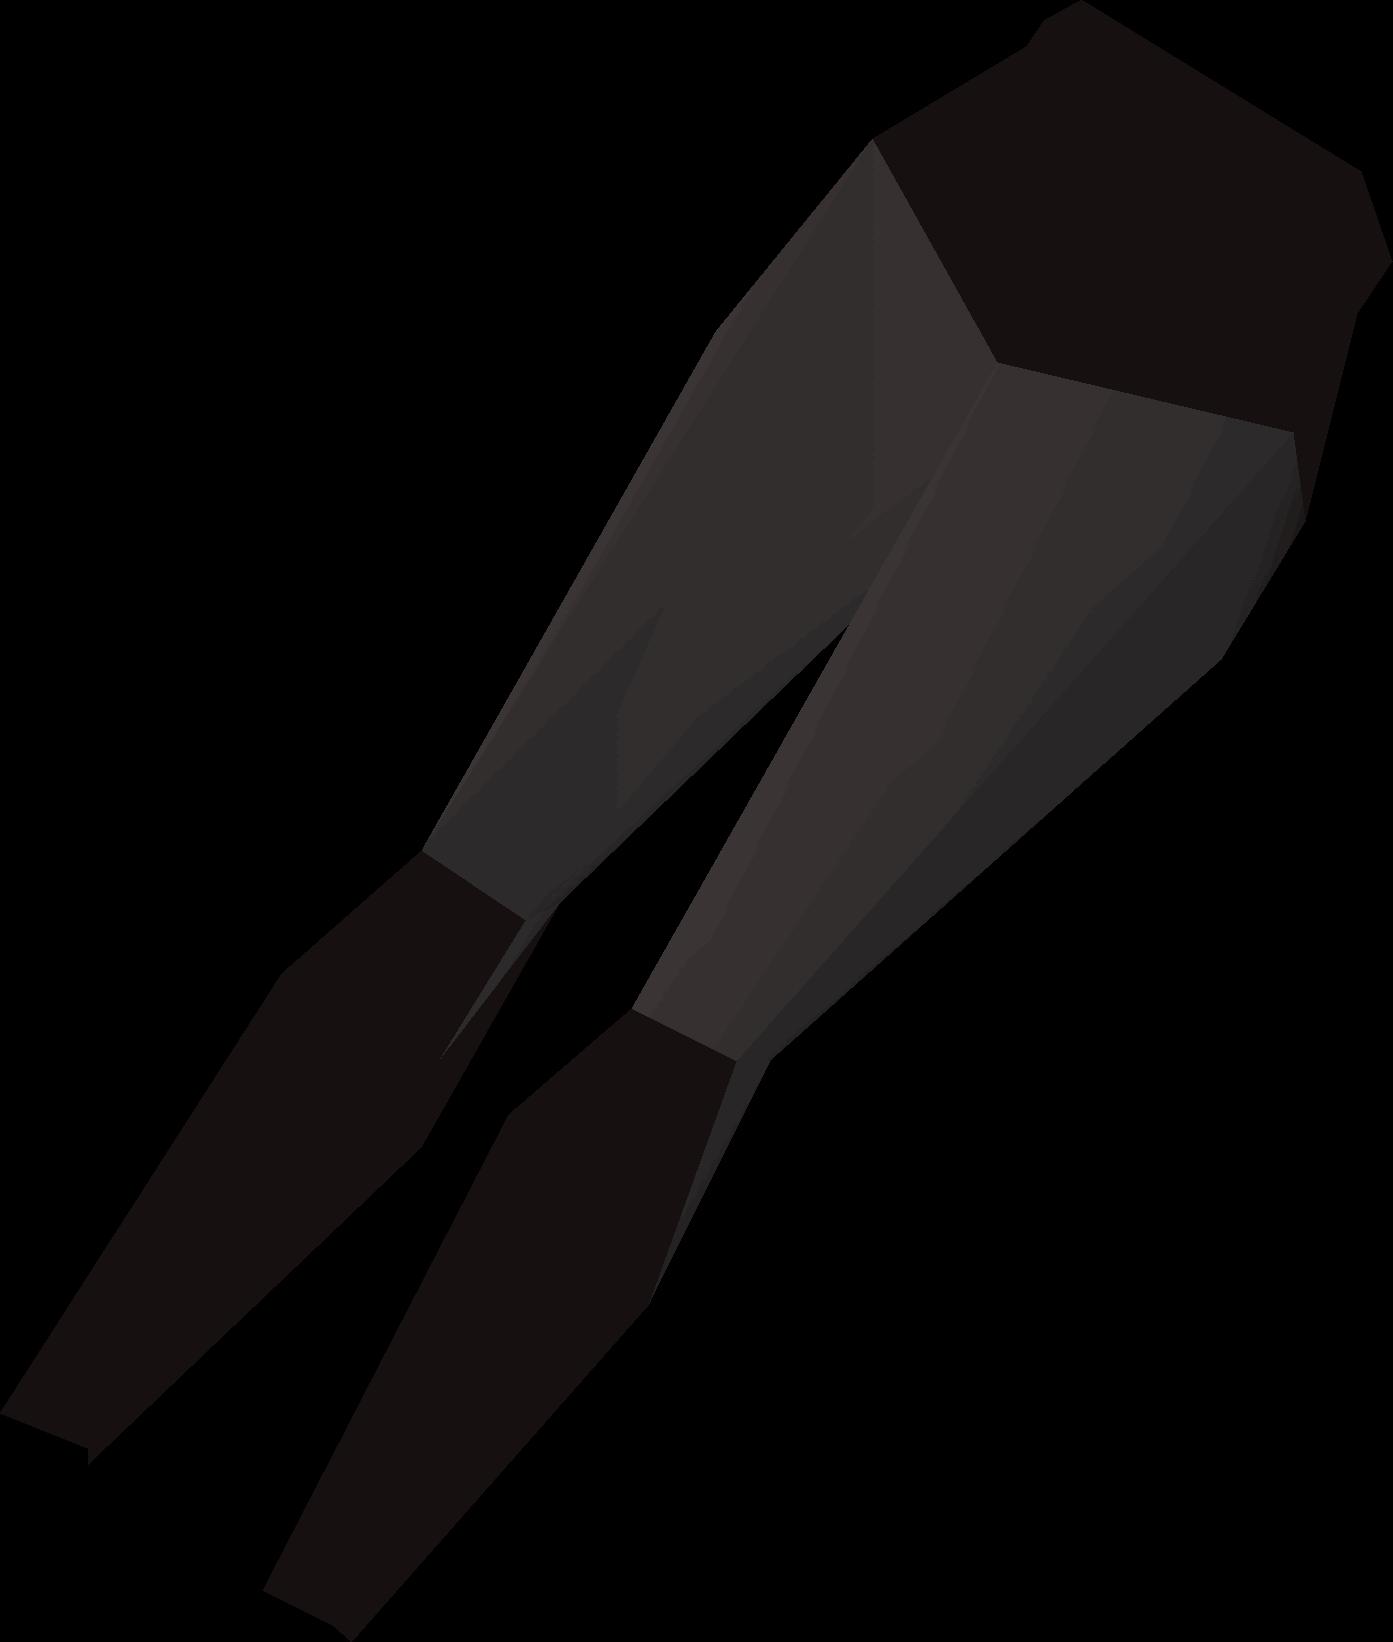 Vyrewatch legs